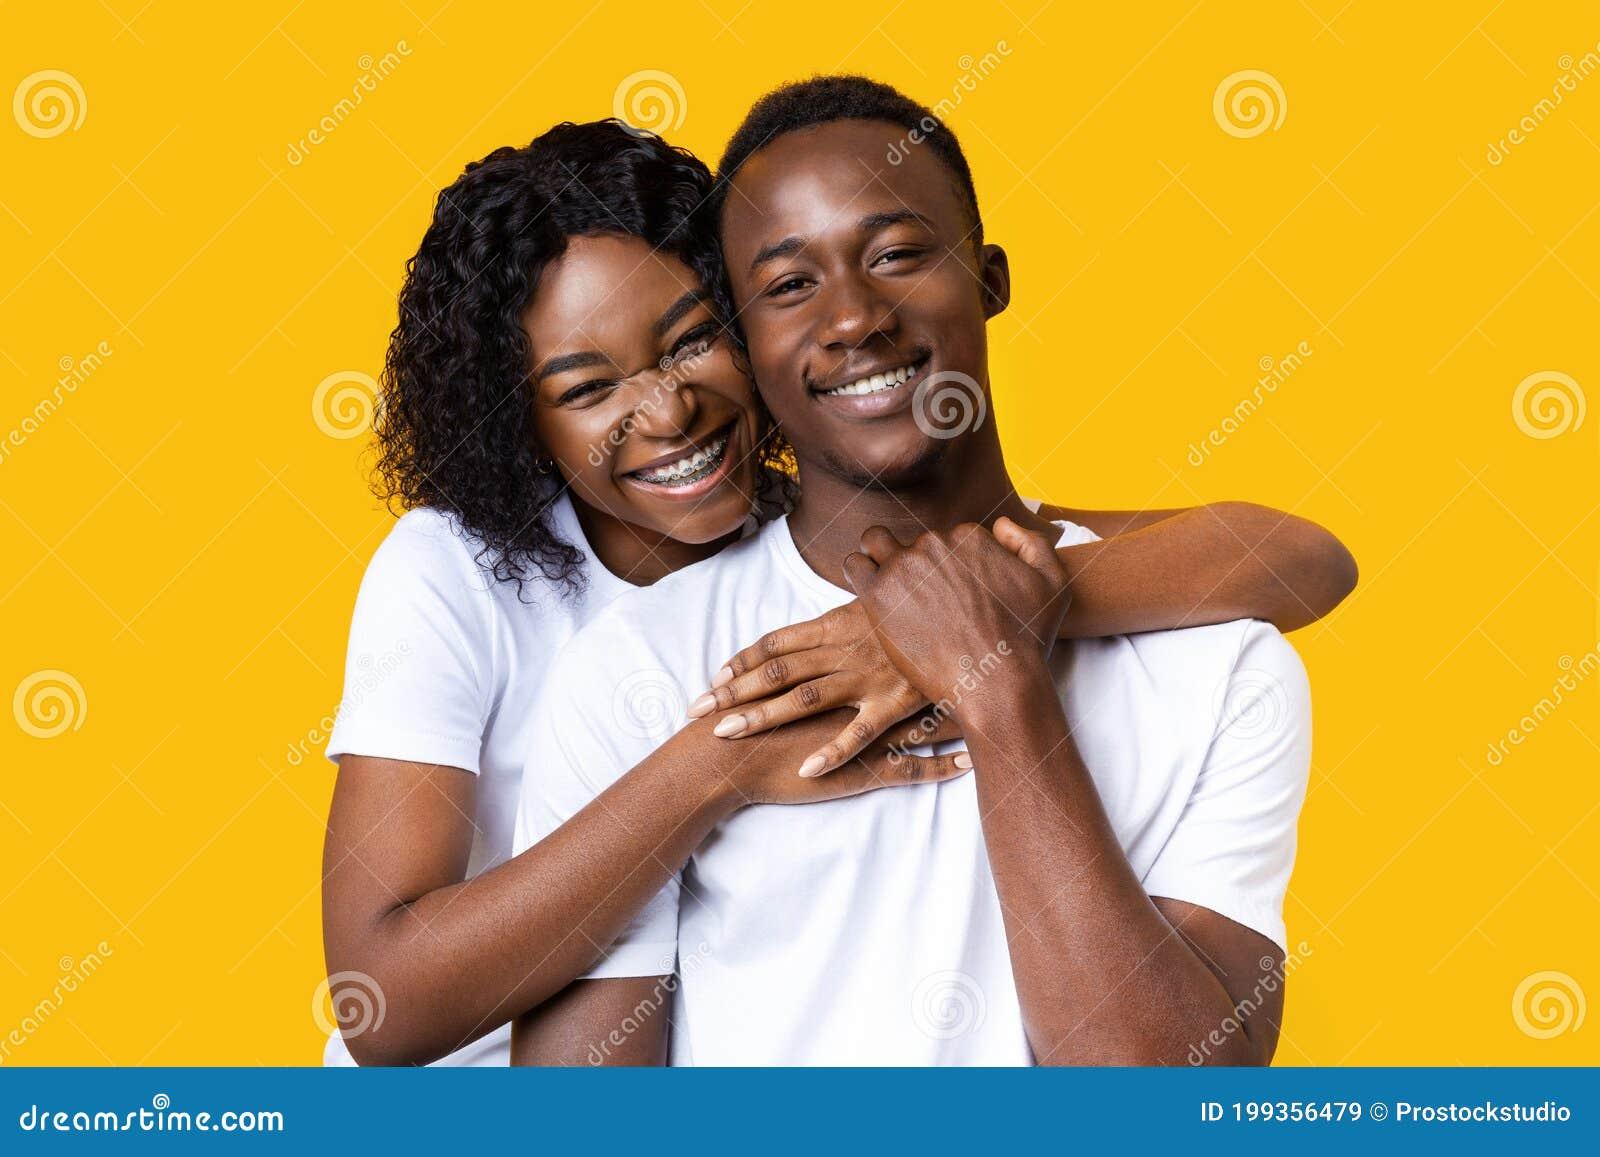 Women african dating american men african Meet Black